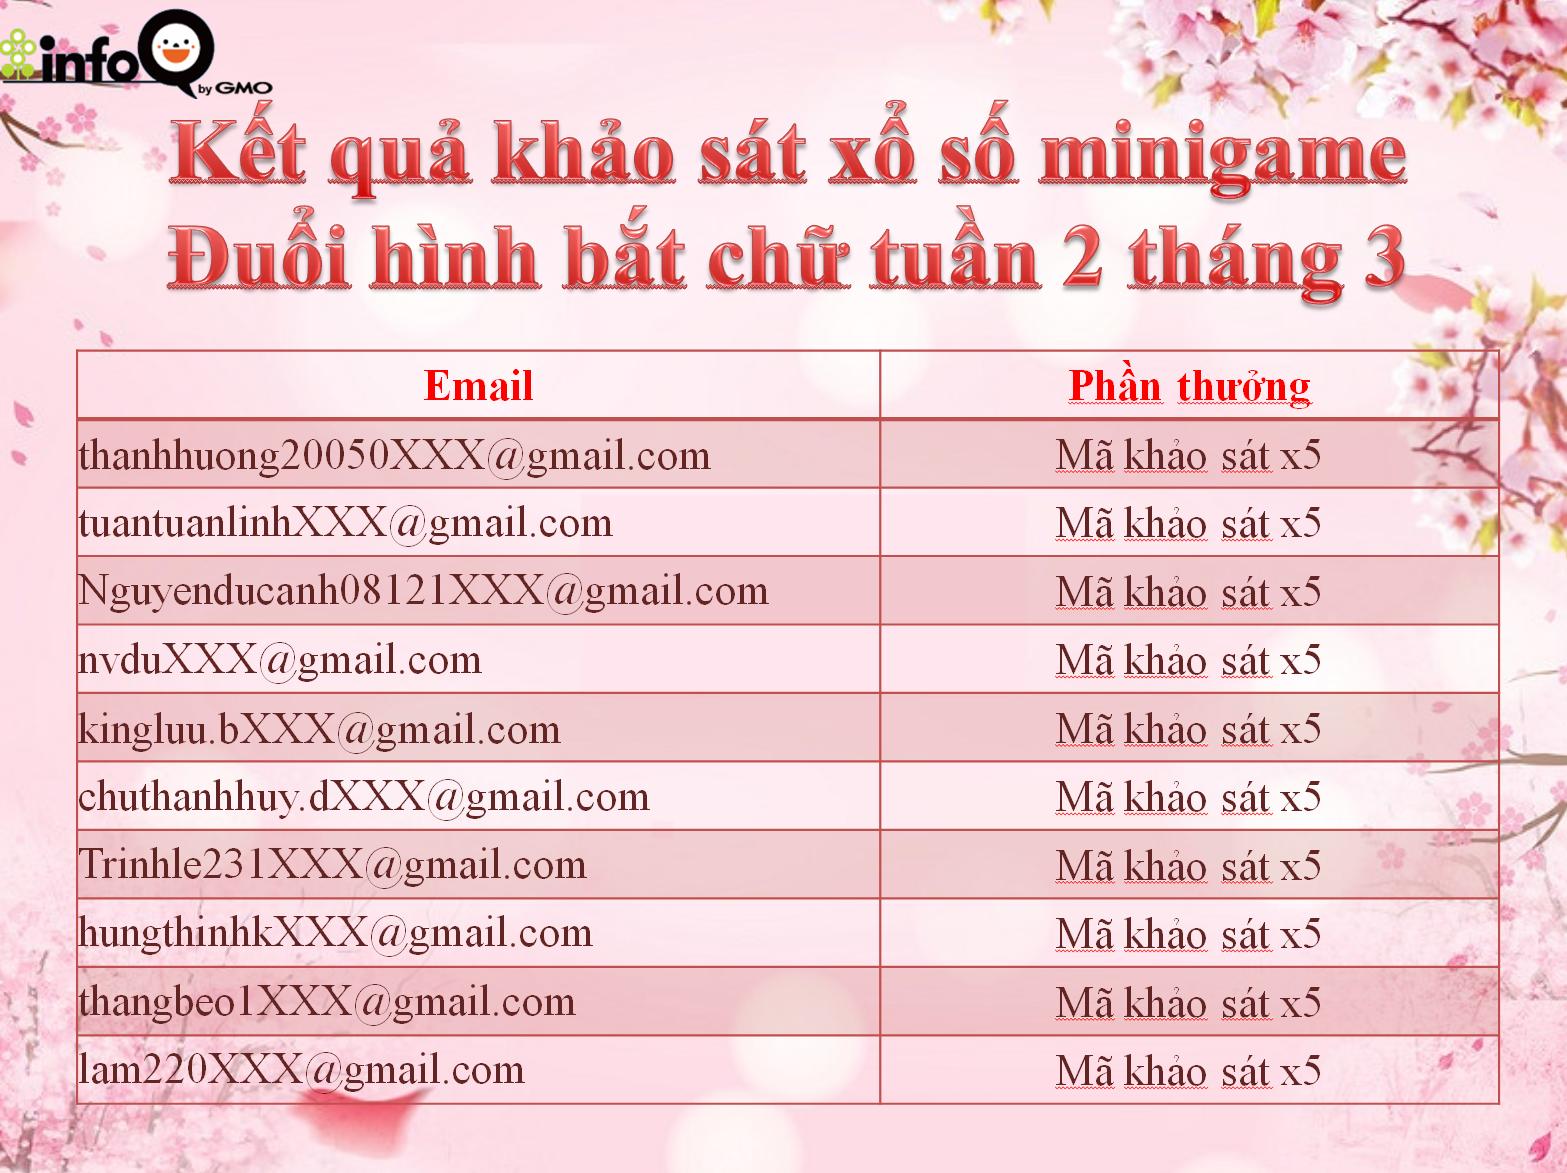 ket-qua-khao-sat-xo-so-minigame-duoi-hinh-bat-chu-tuan-2-thang-3